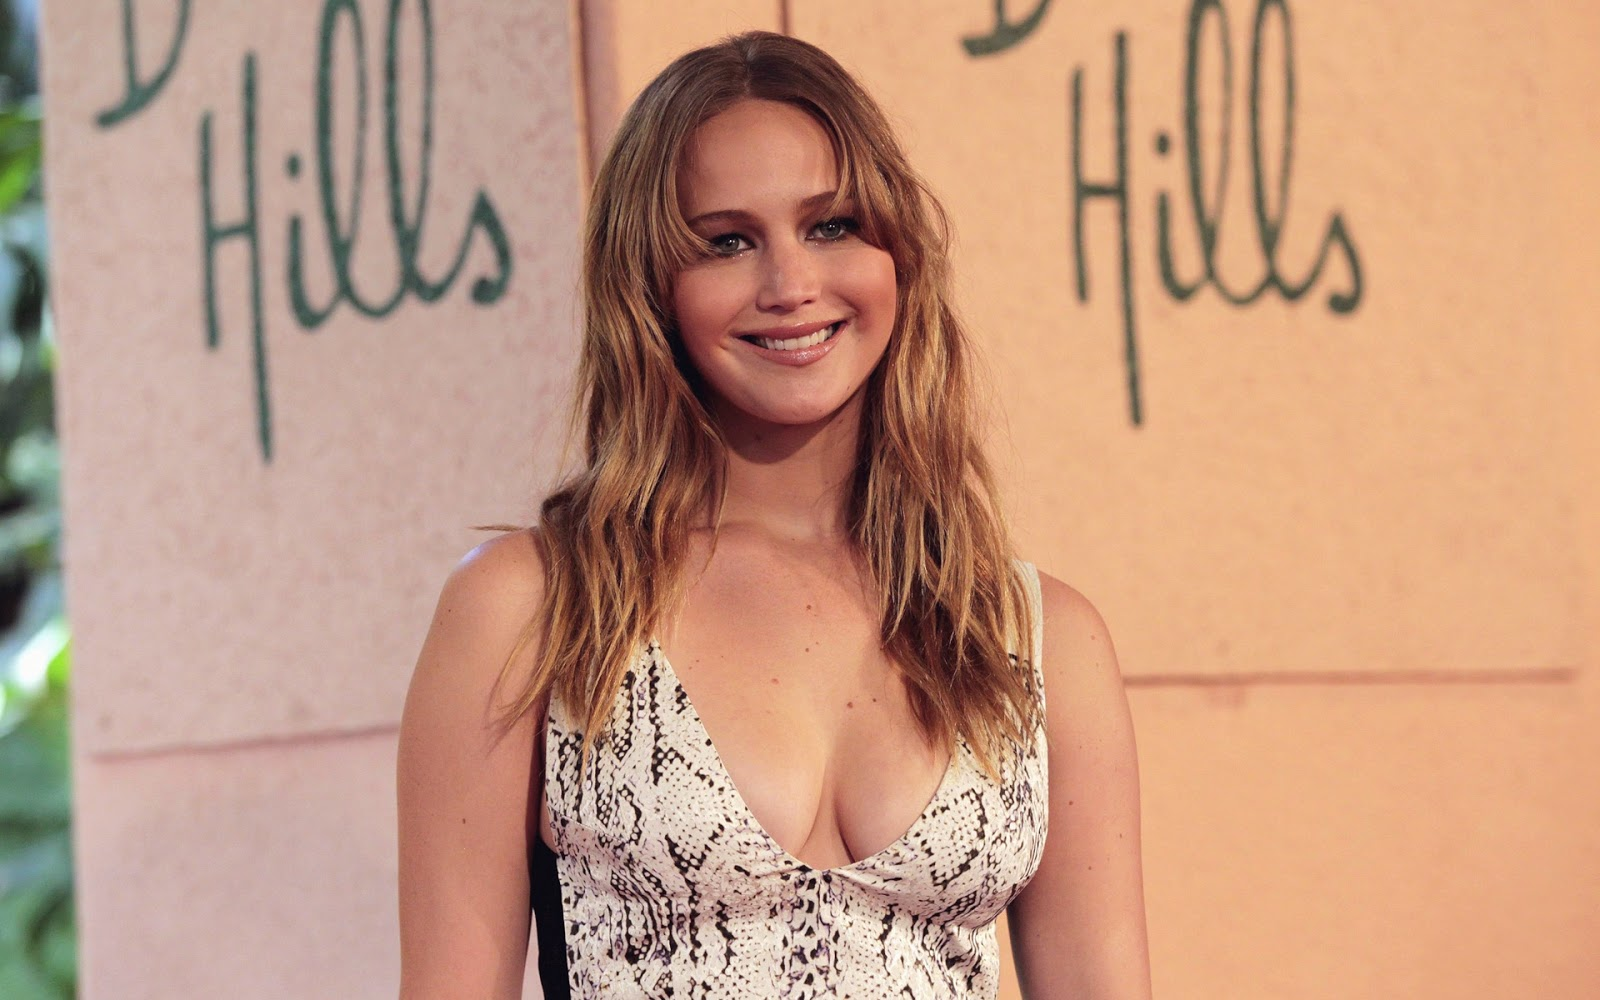 actress hot actr...Actress Jennifer Lawrence Wikipedia